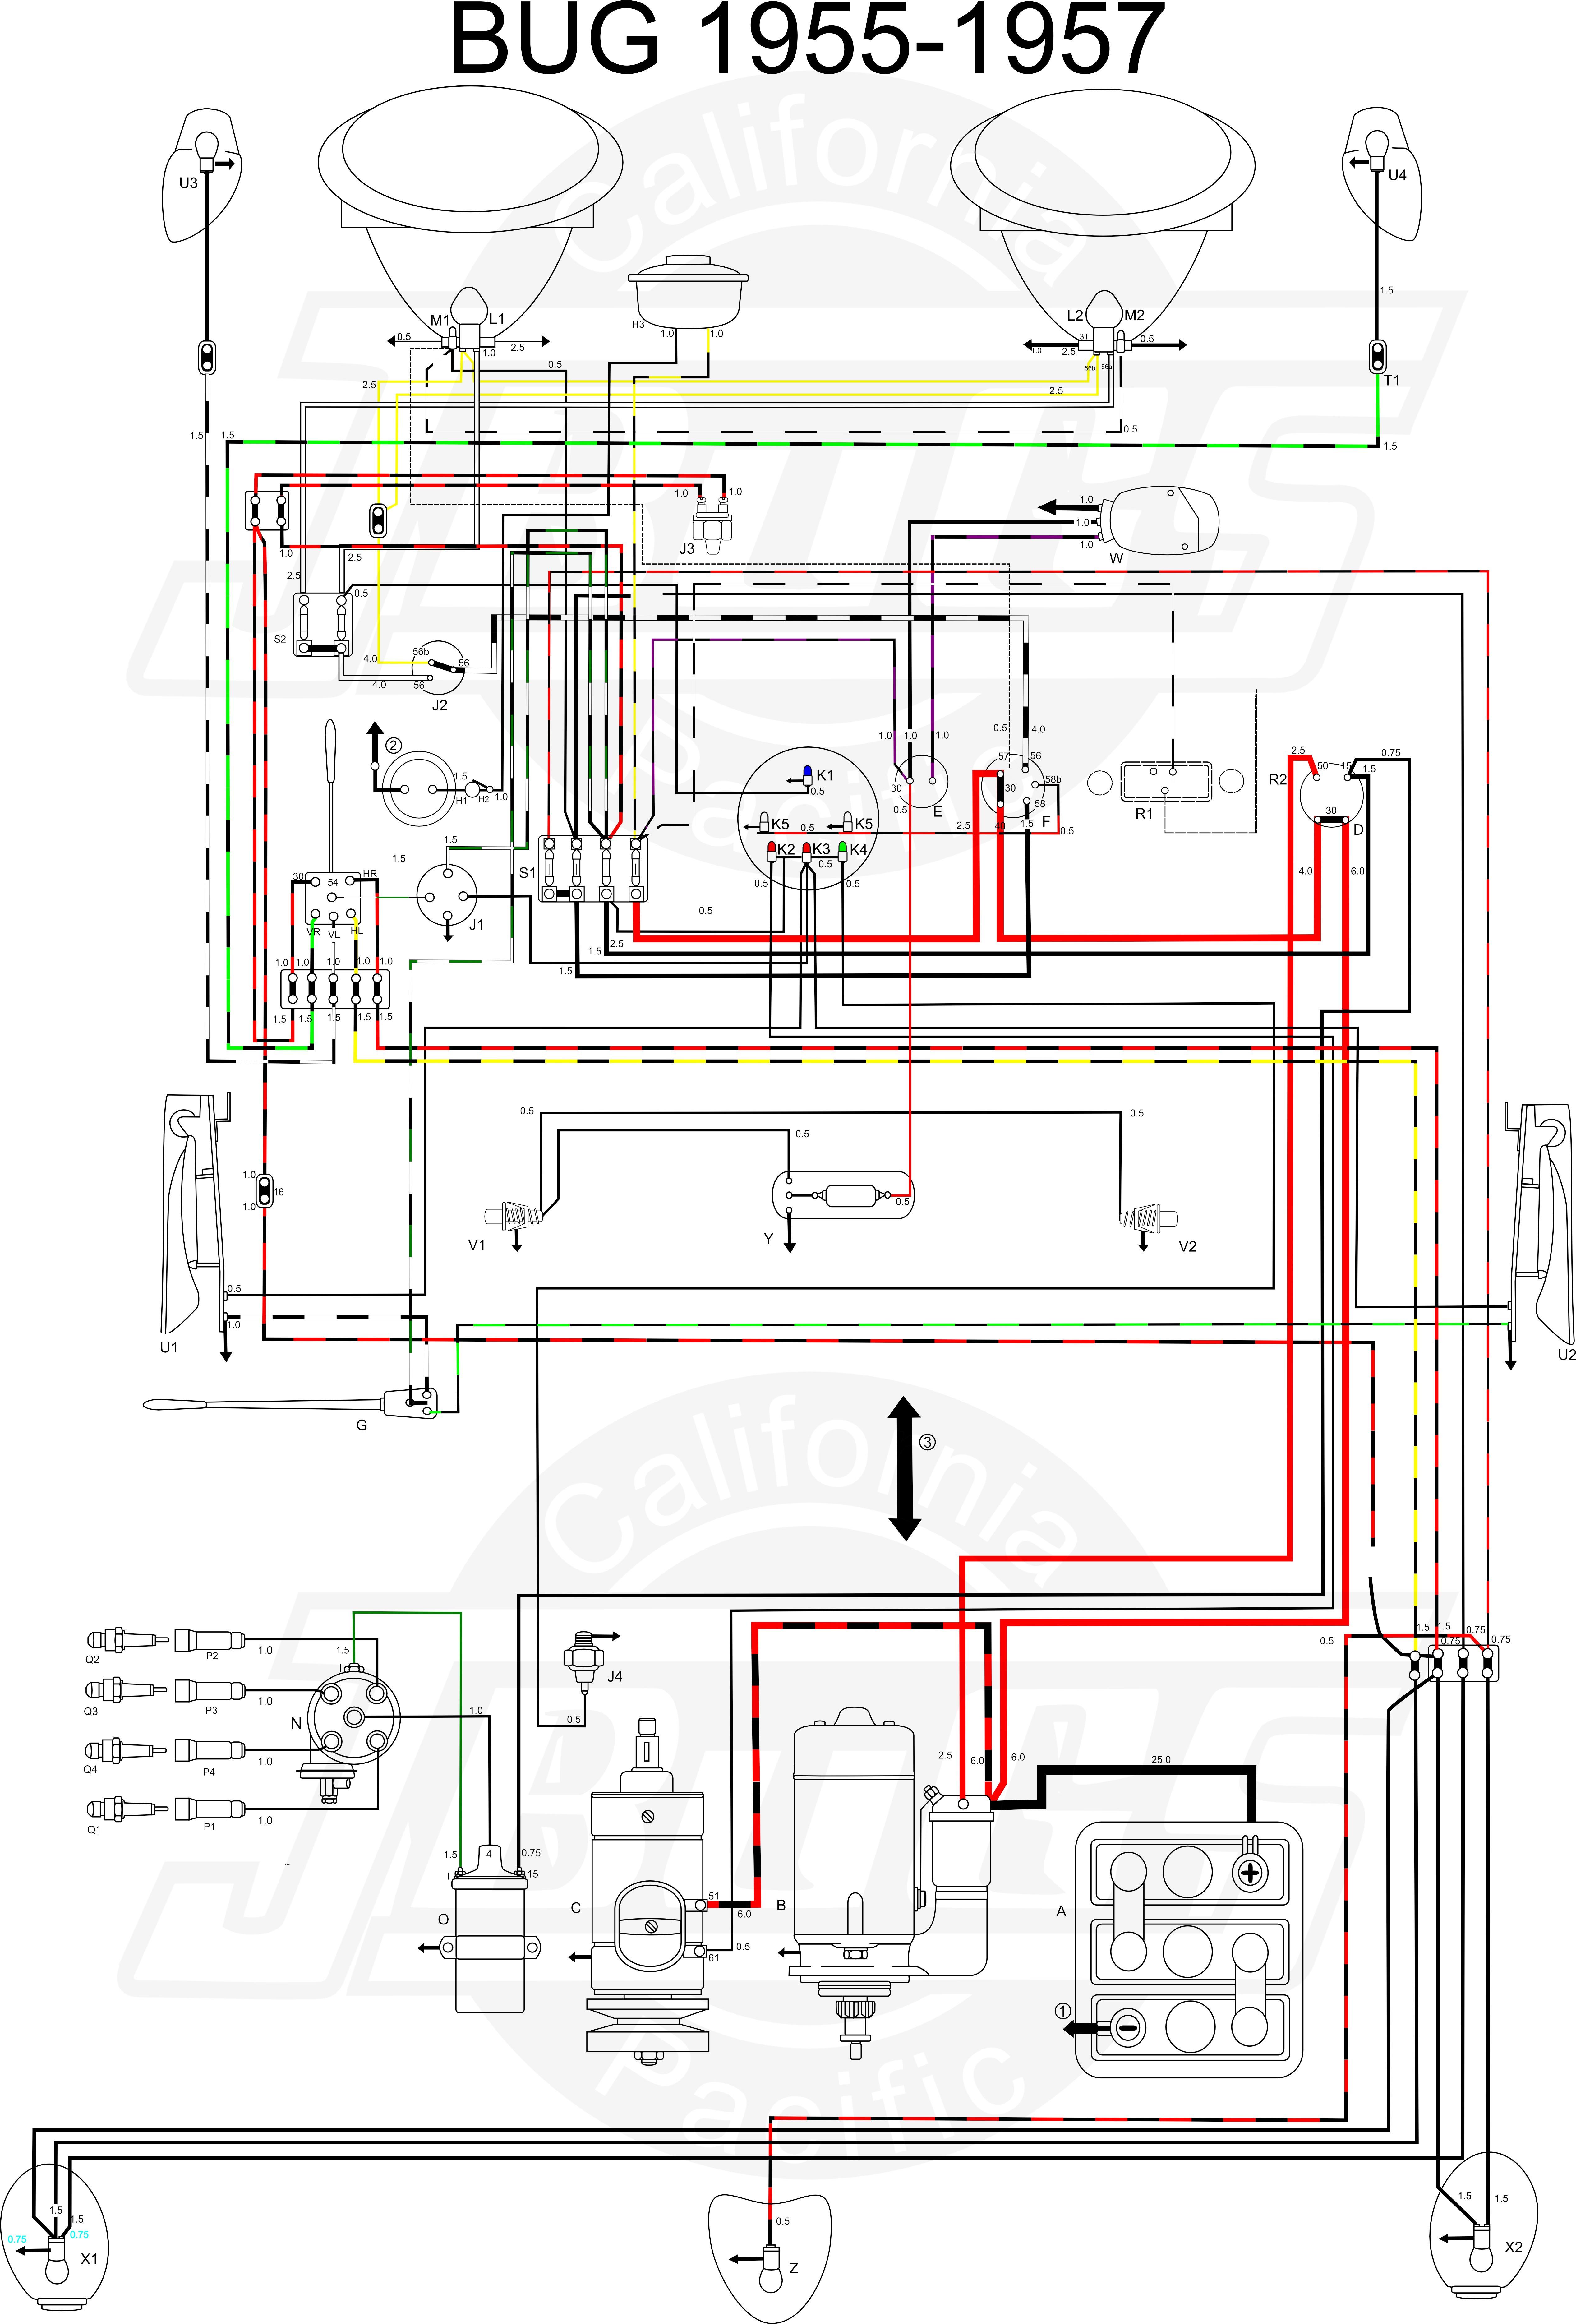 2000 Vw Beetle Parts Diagram Vw Beetle Turn Signal Wiring Diagram 1973 Vw Wiring Diagram Vw Of 2000 Vw Beetle Parts Diagram